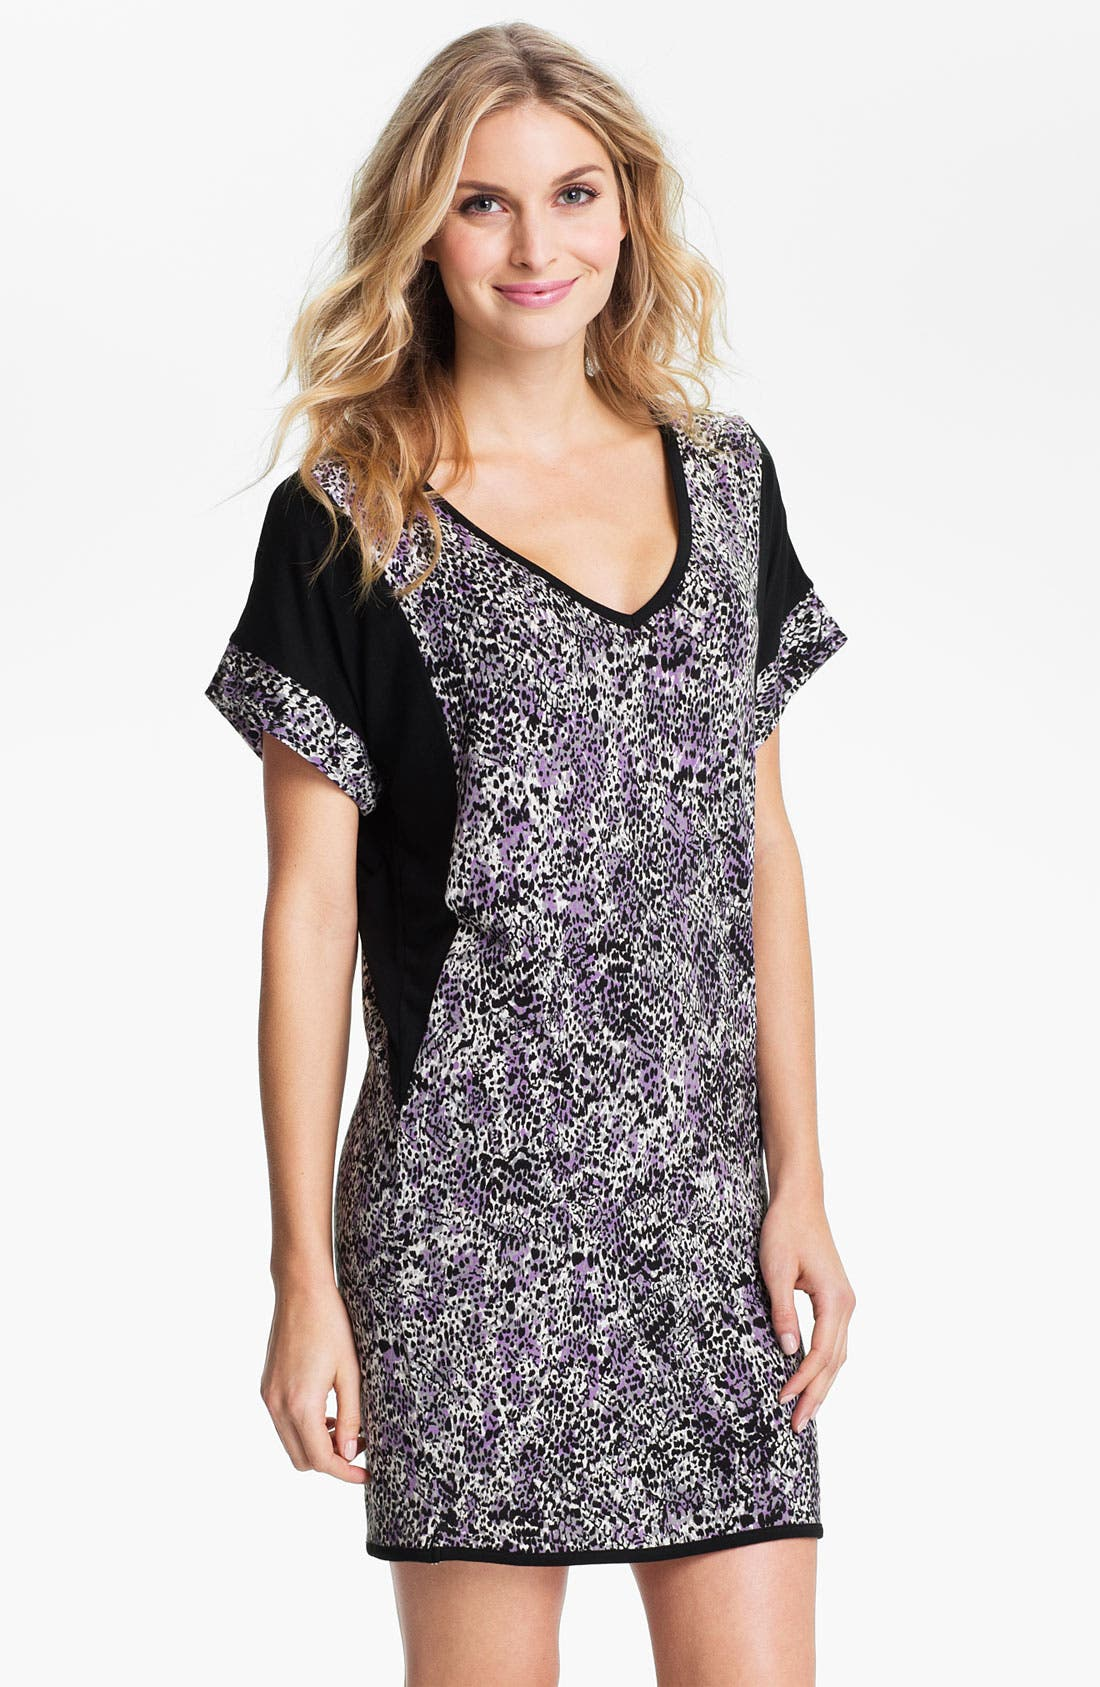 Alternate Image 1 Selected - DKNY Short Sleeve Sleep Shirt